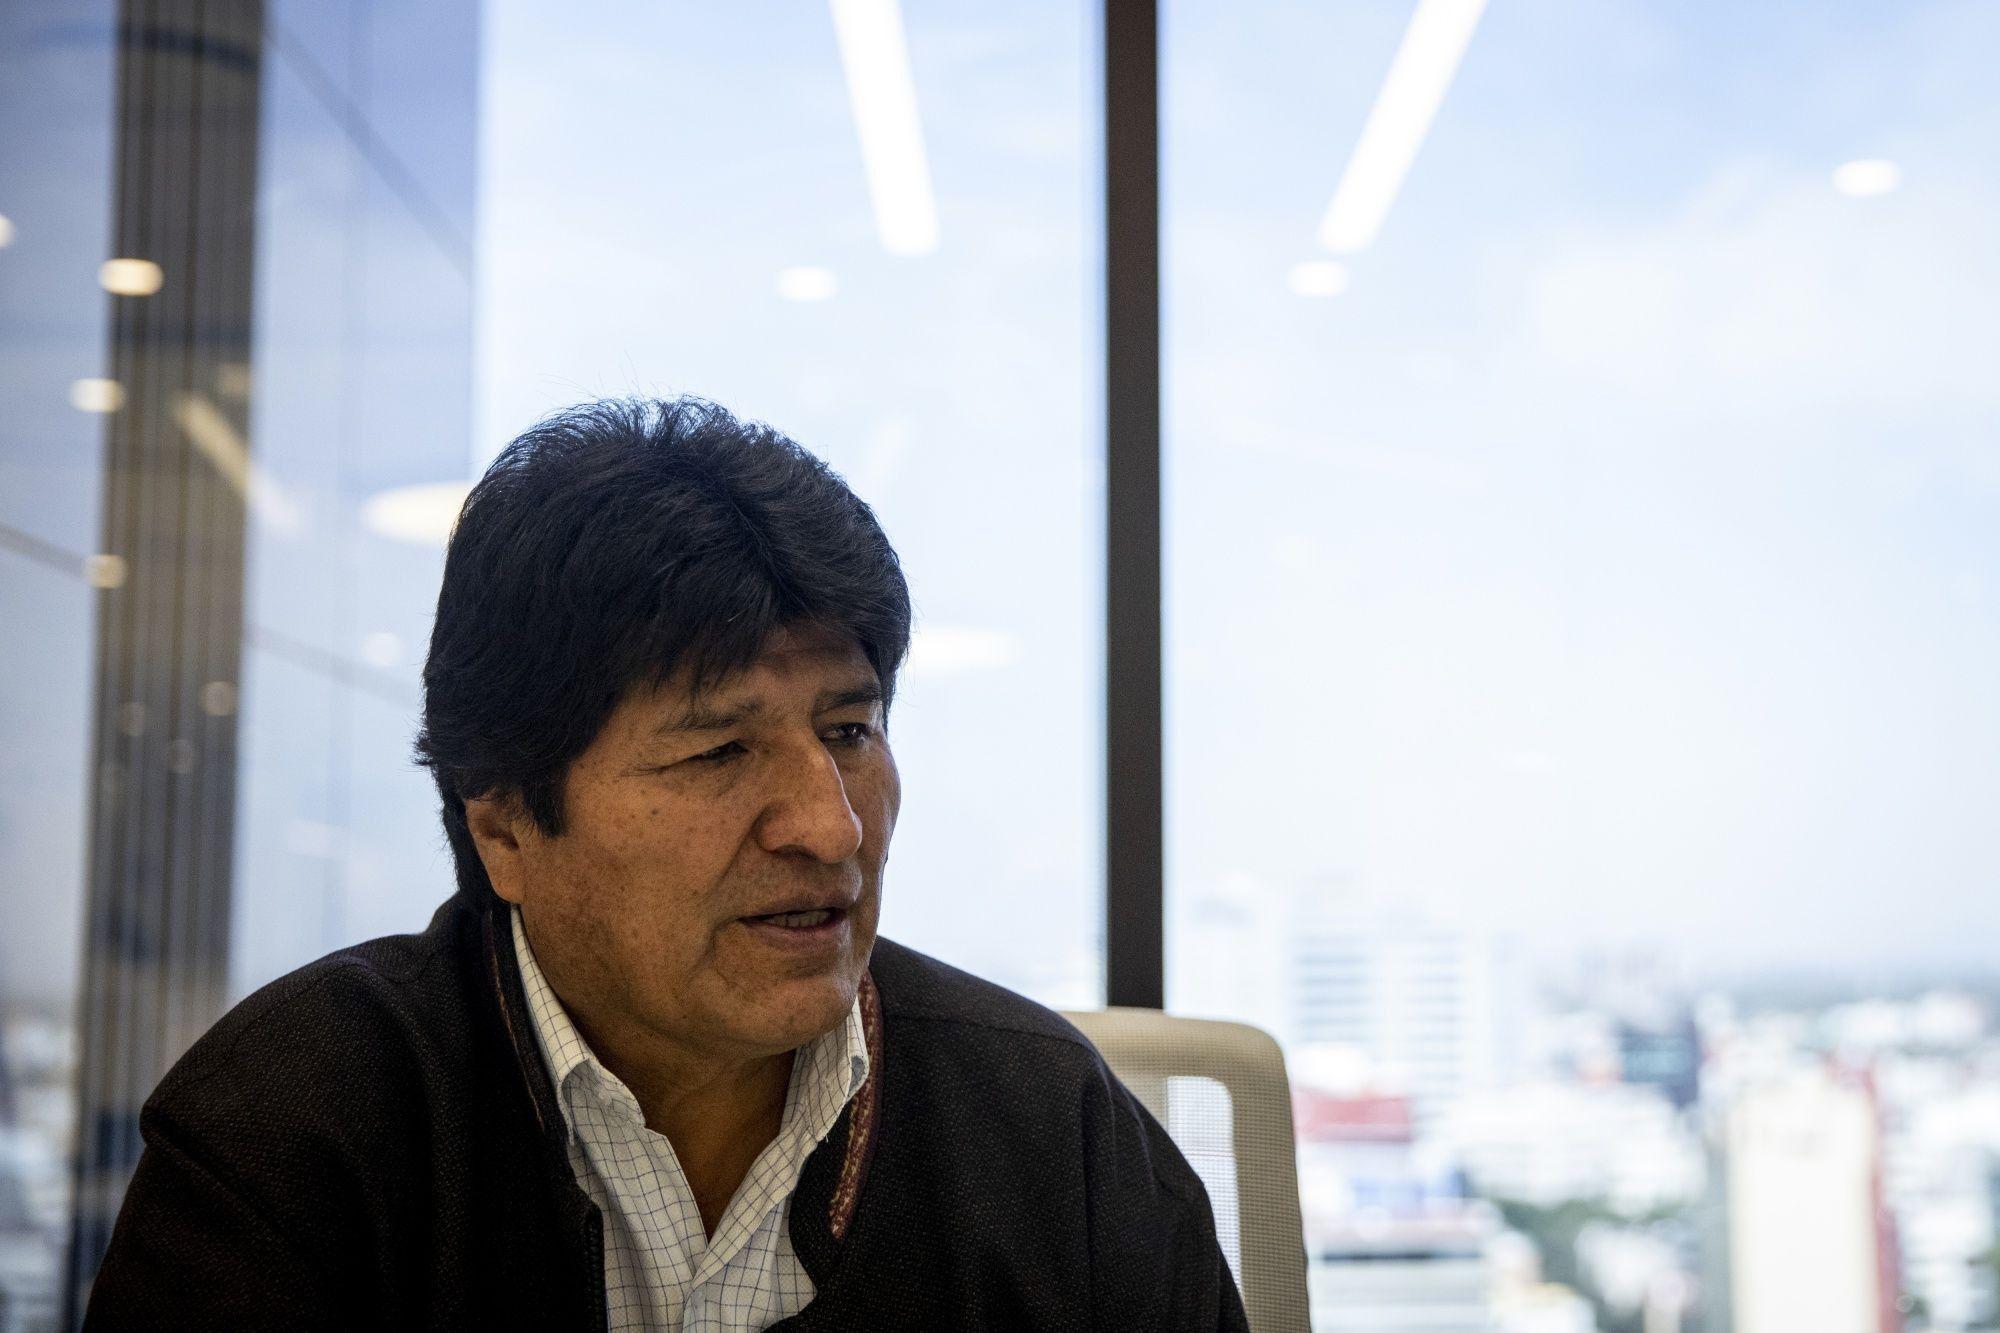 Former Bolivian President Evo Morales Interview